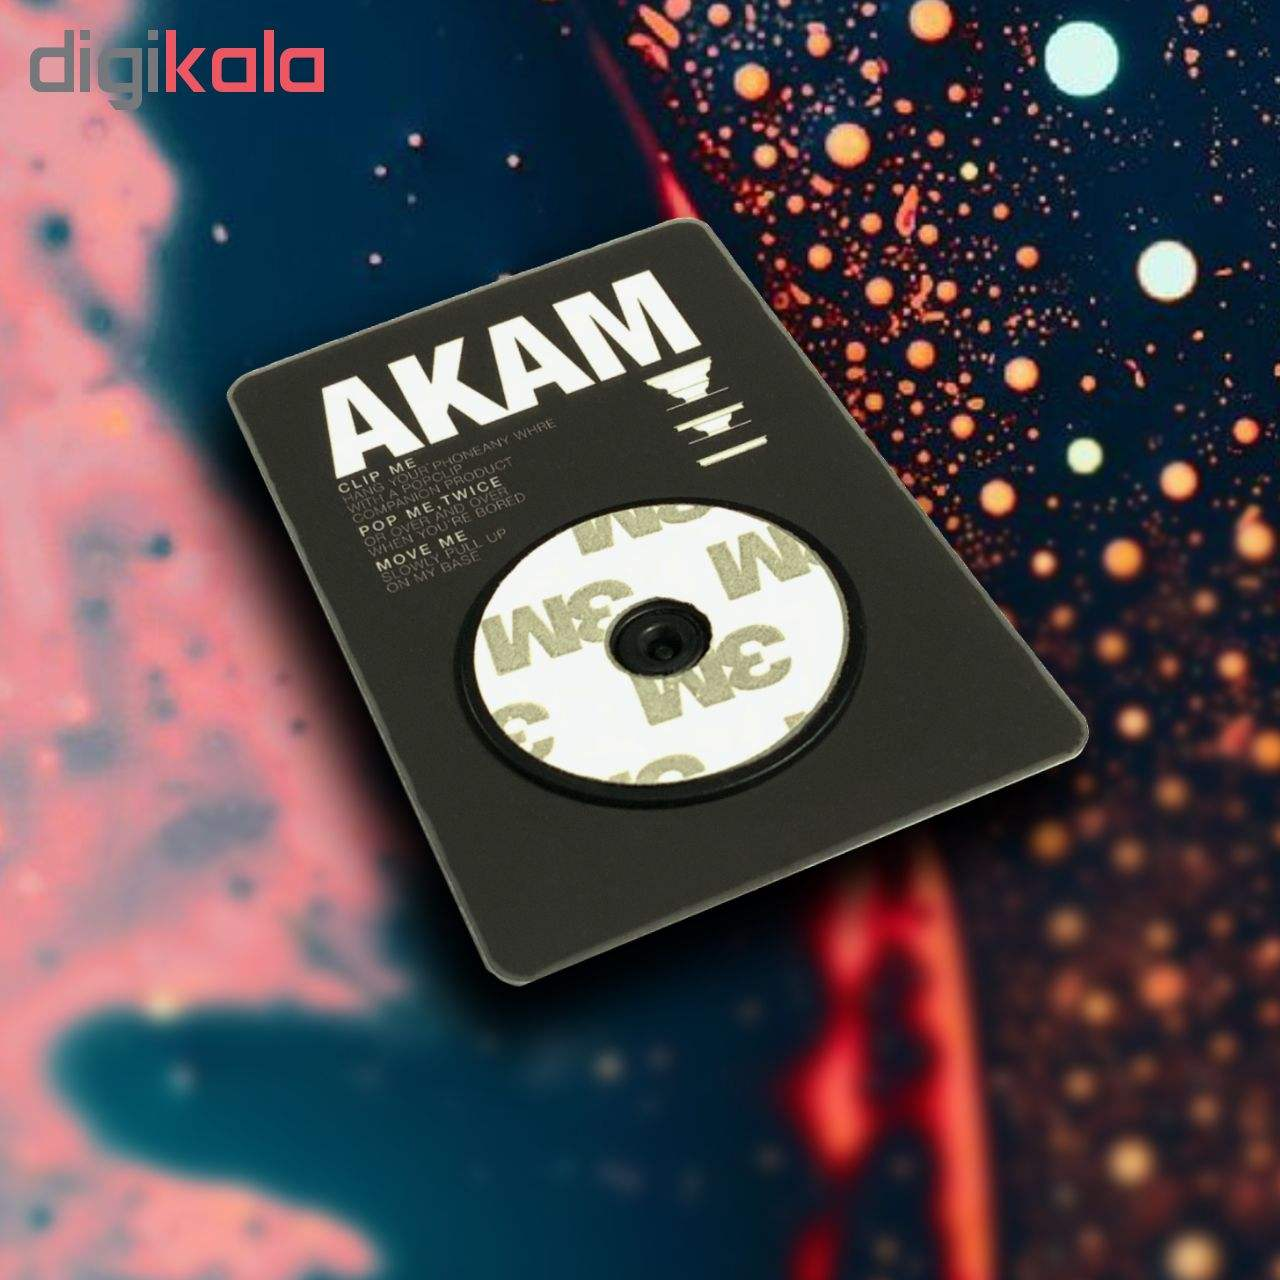 پایه نگهدارنده گوشی موبایل پاپ سوکت آکام مدل APS0054 main 1 2